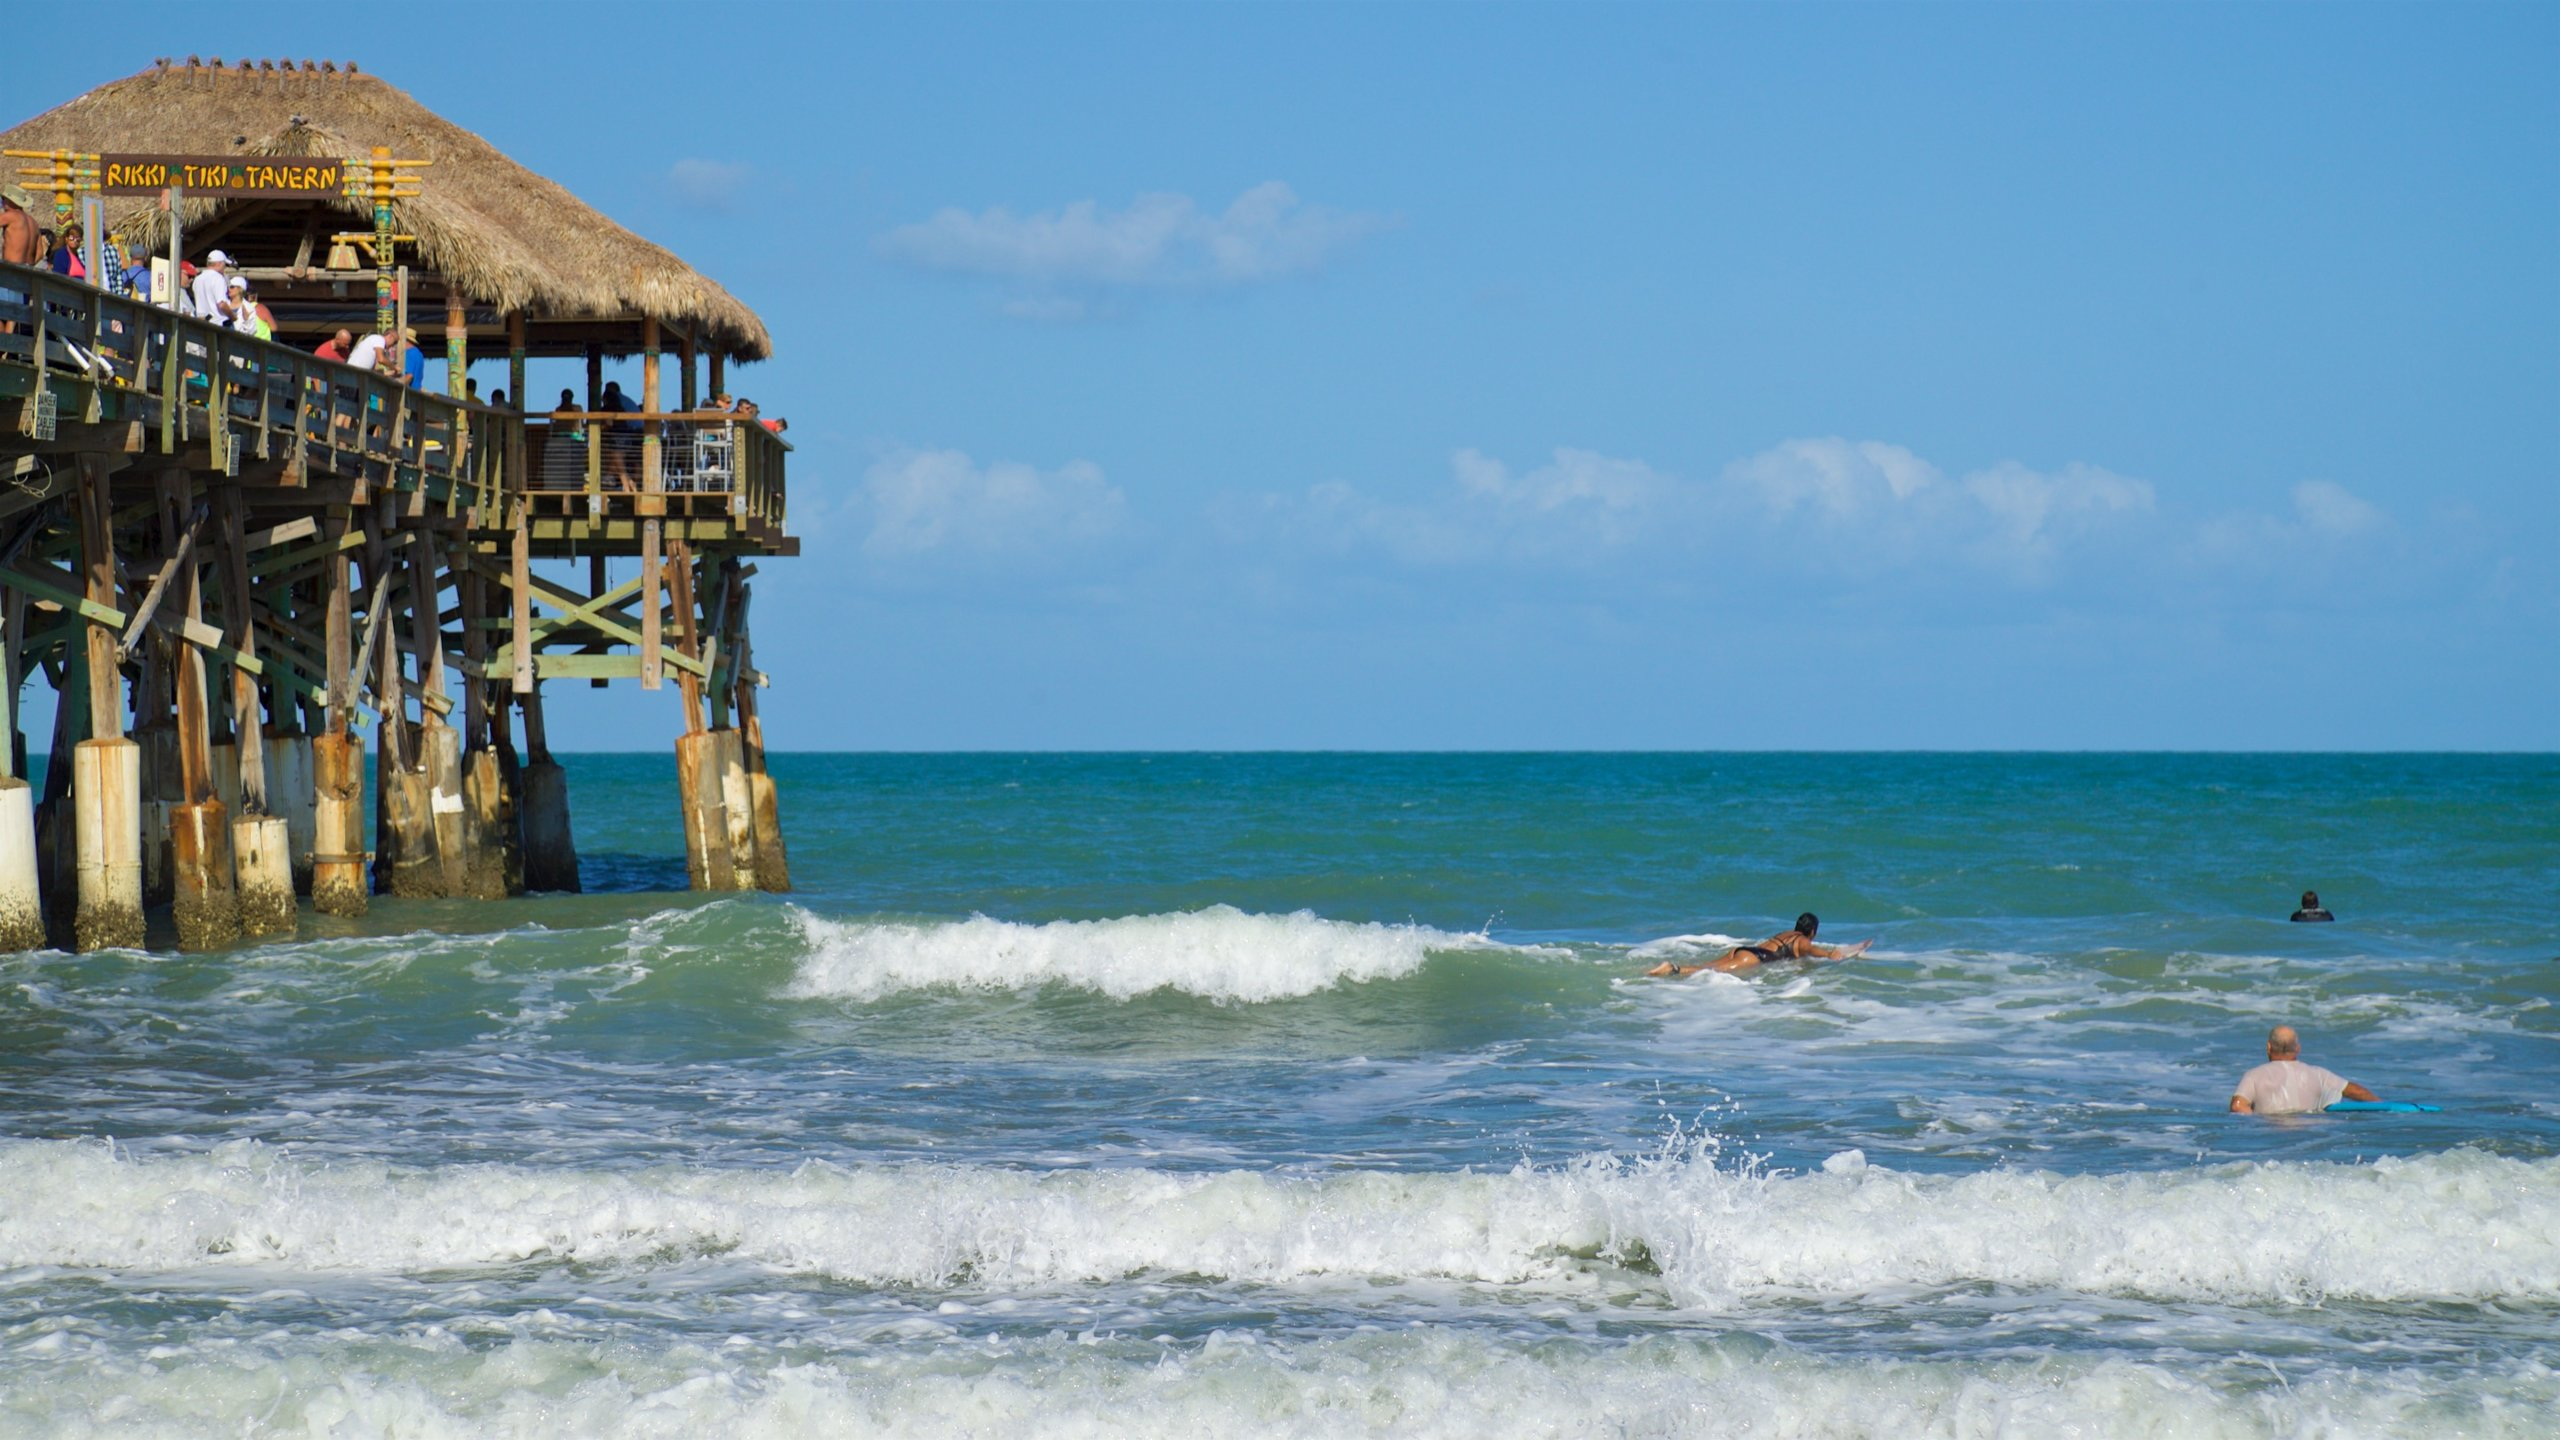 Avon By The Sea, Cocoa Beach, Florida, United States of America